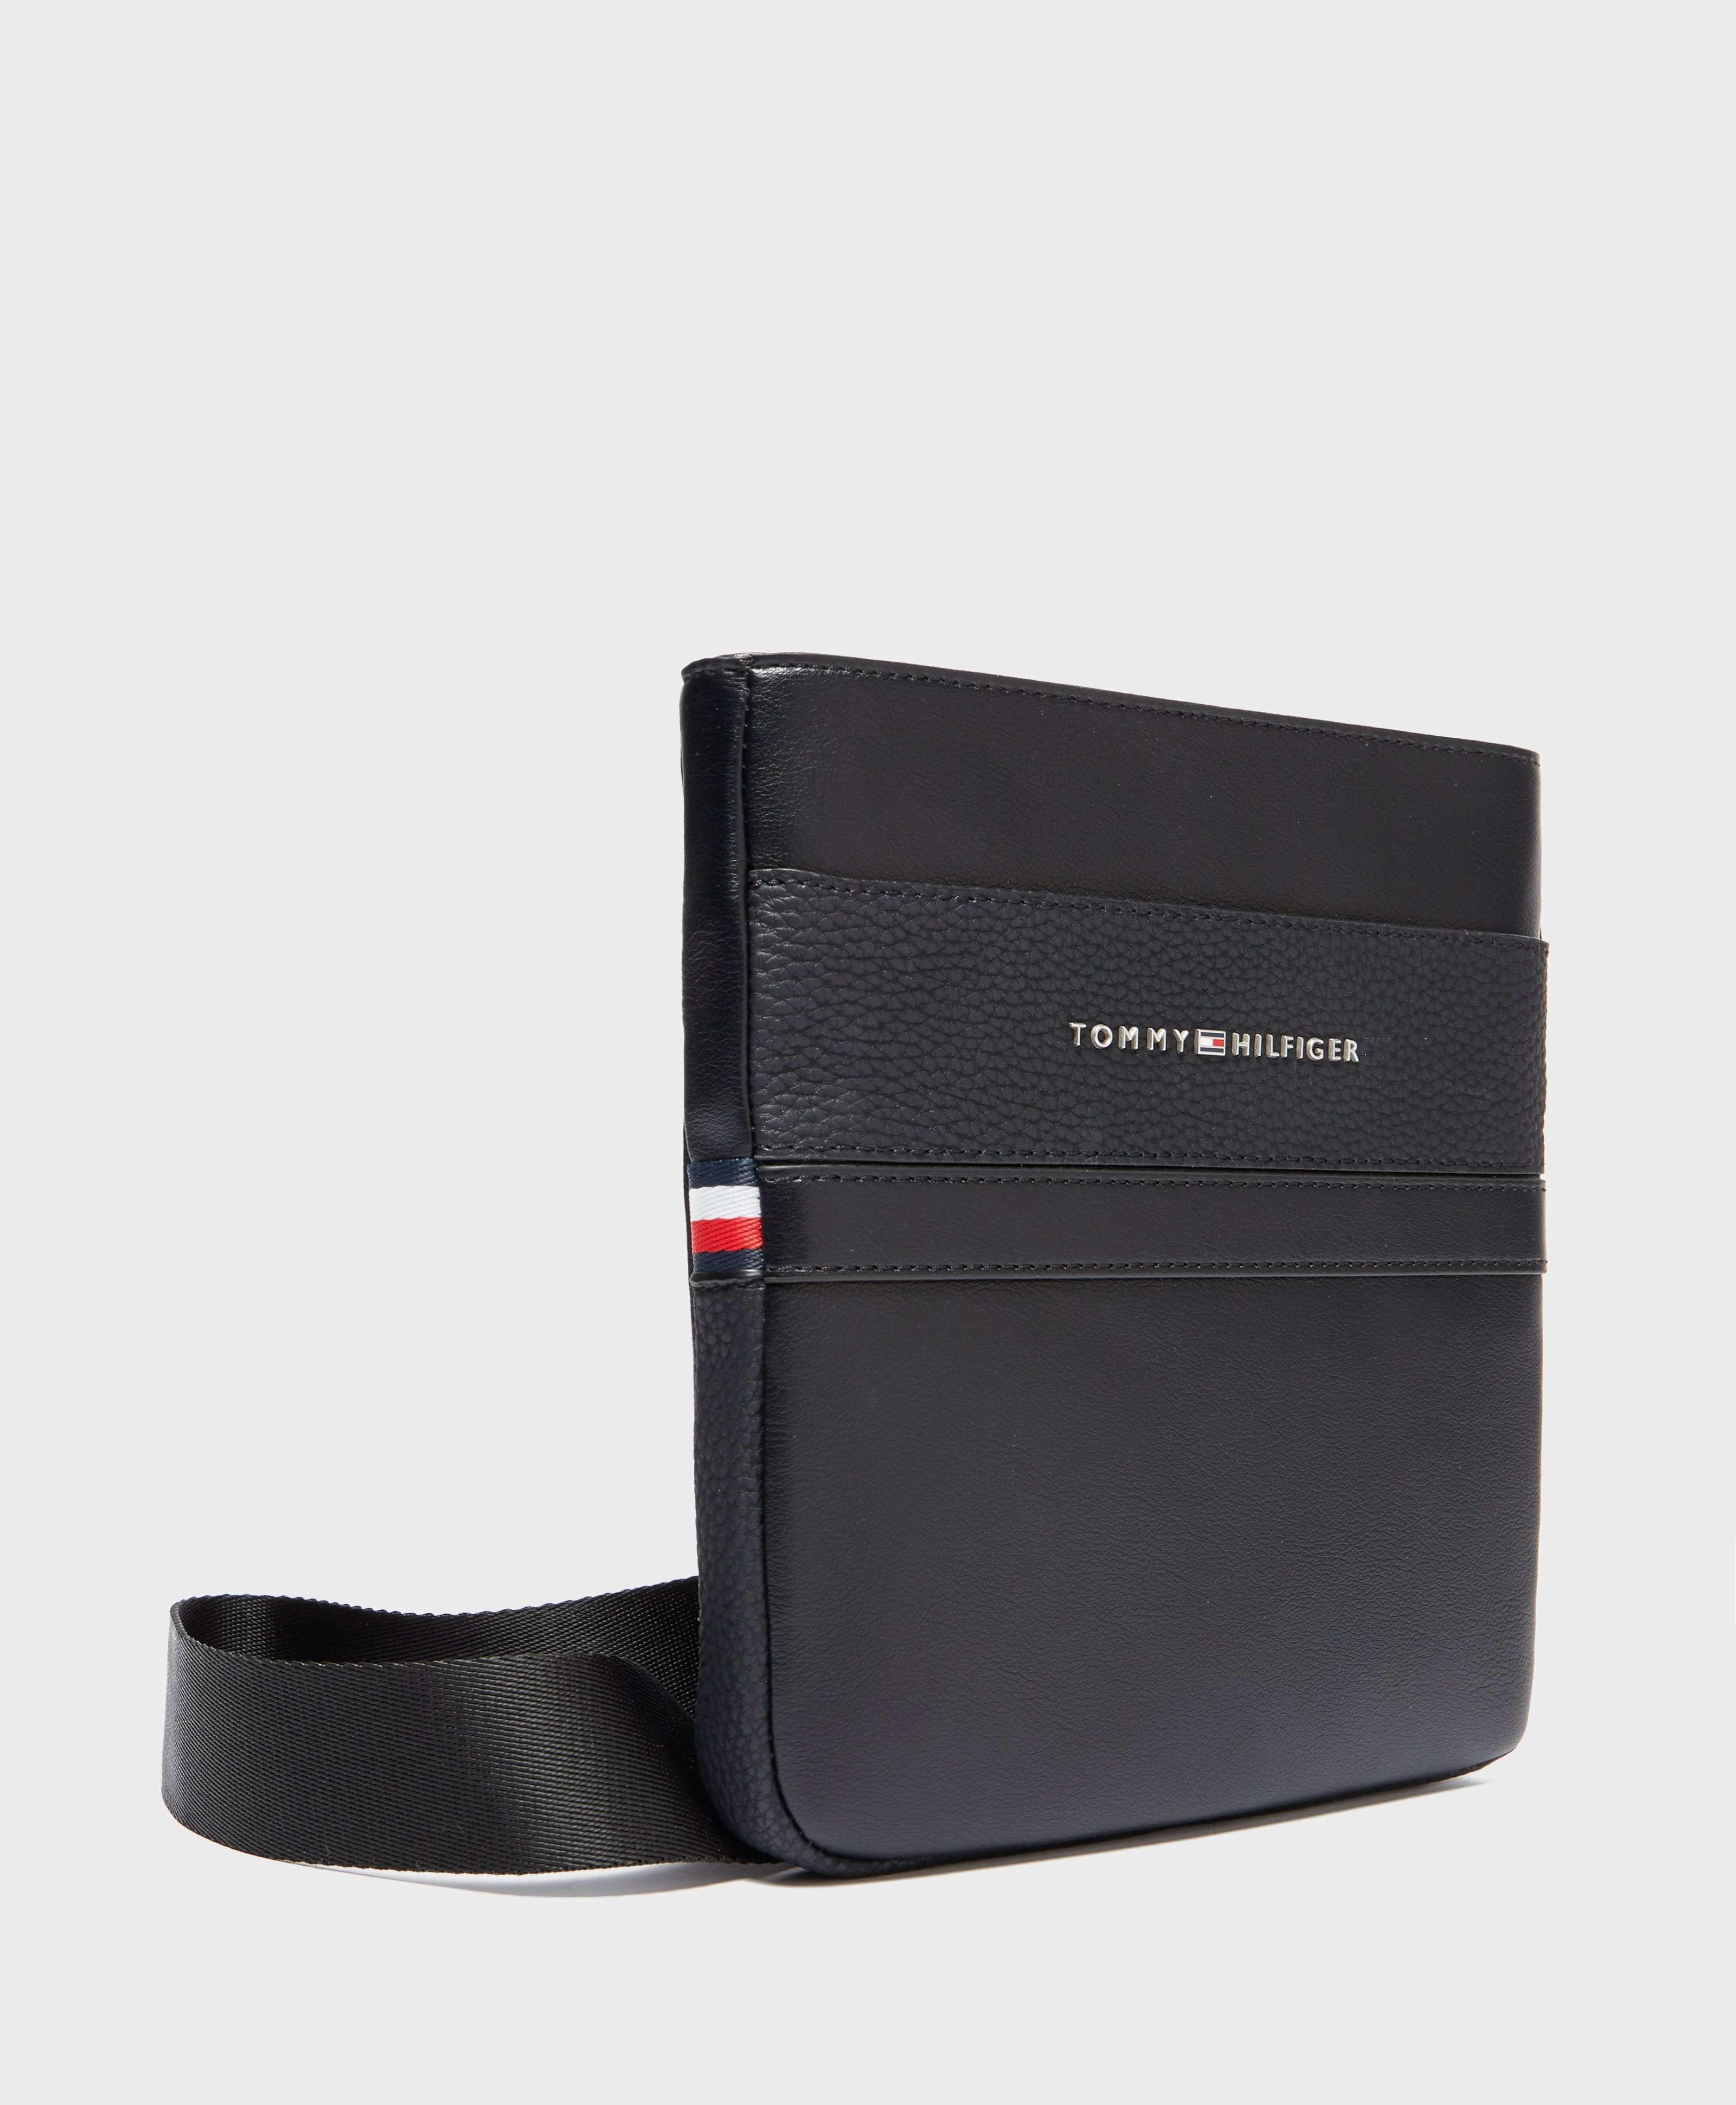 Tommy Hilfiger Business Flat Cross Body Bag